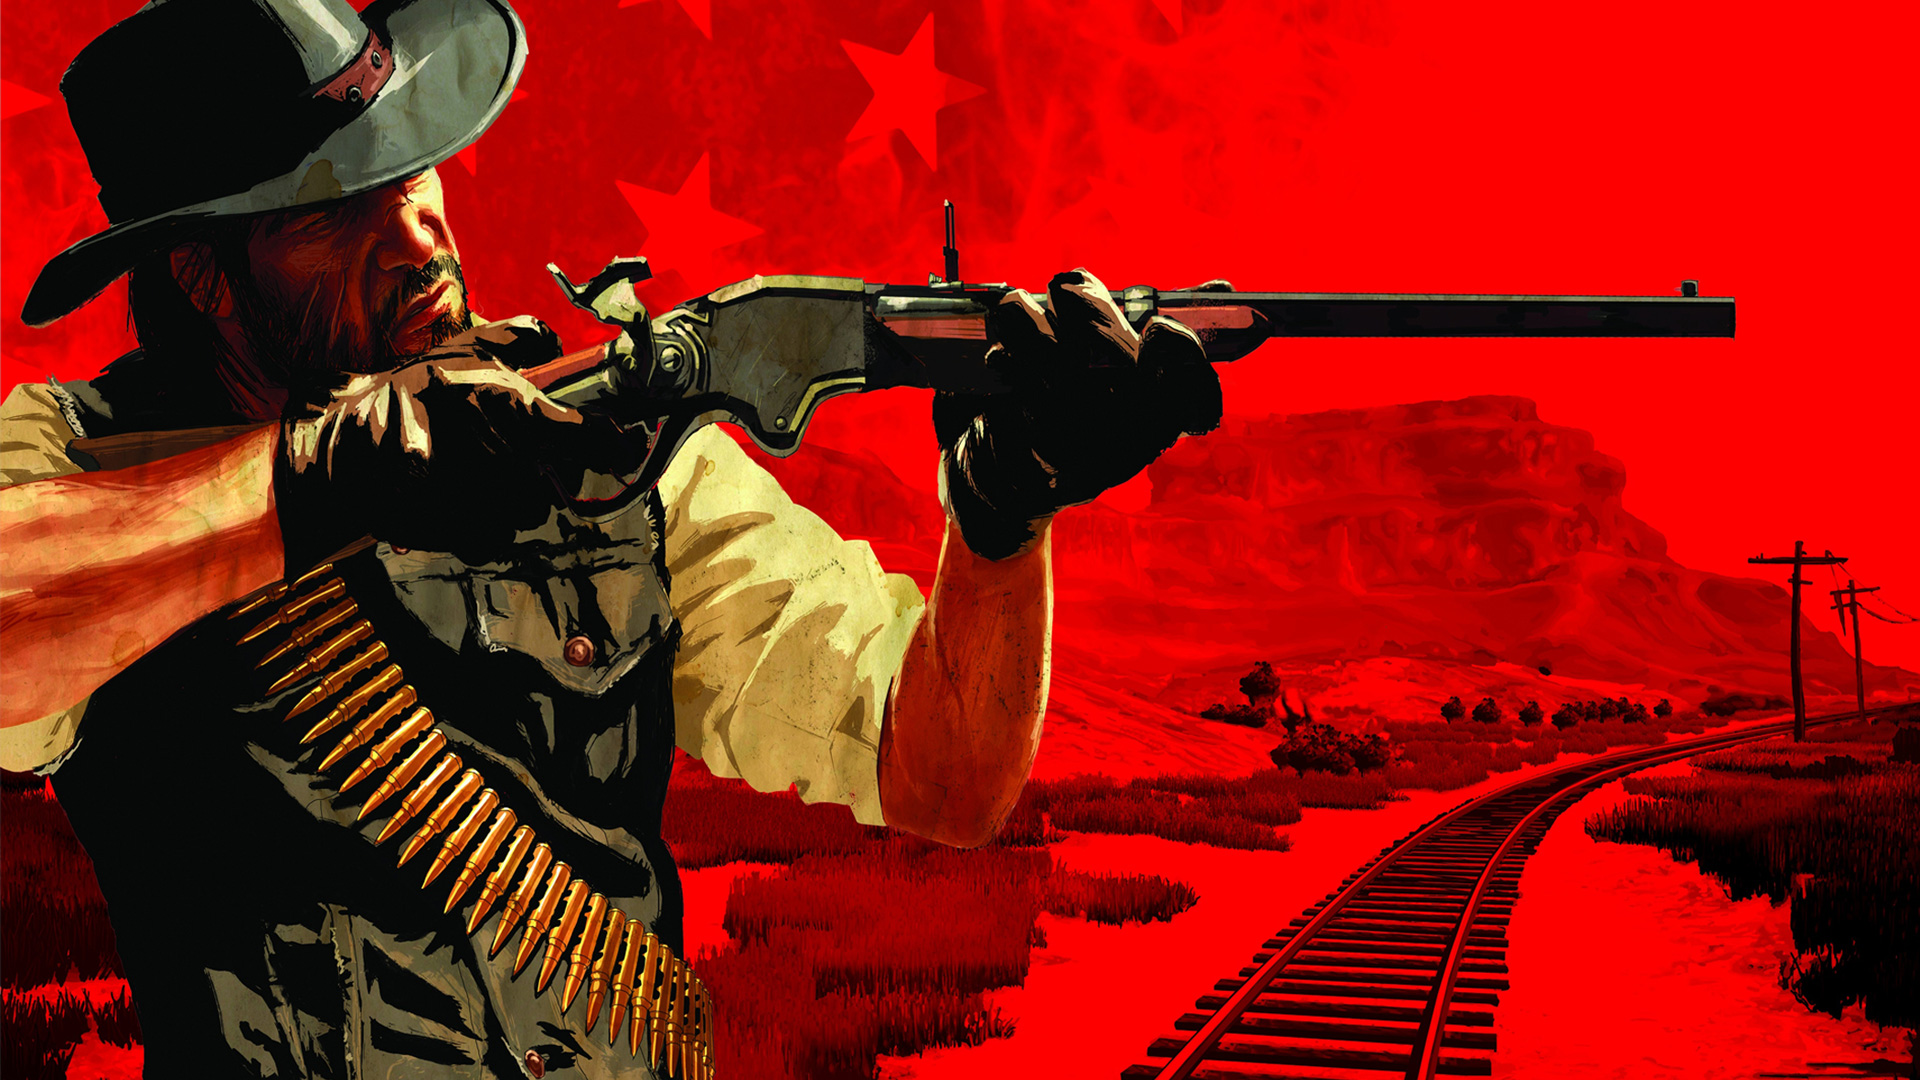 red dead redemption 2 video game desktop wallpaper 68179